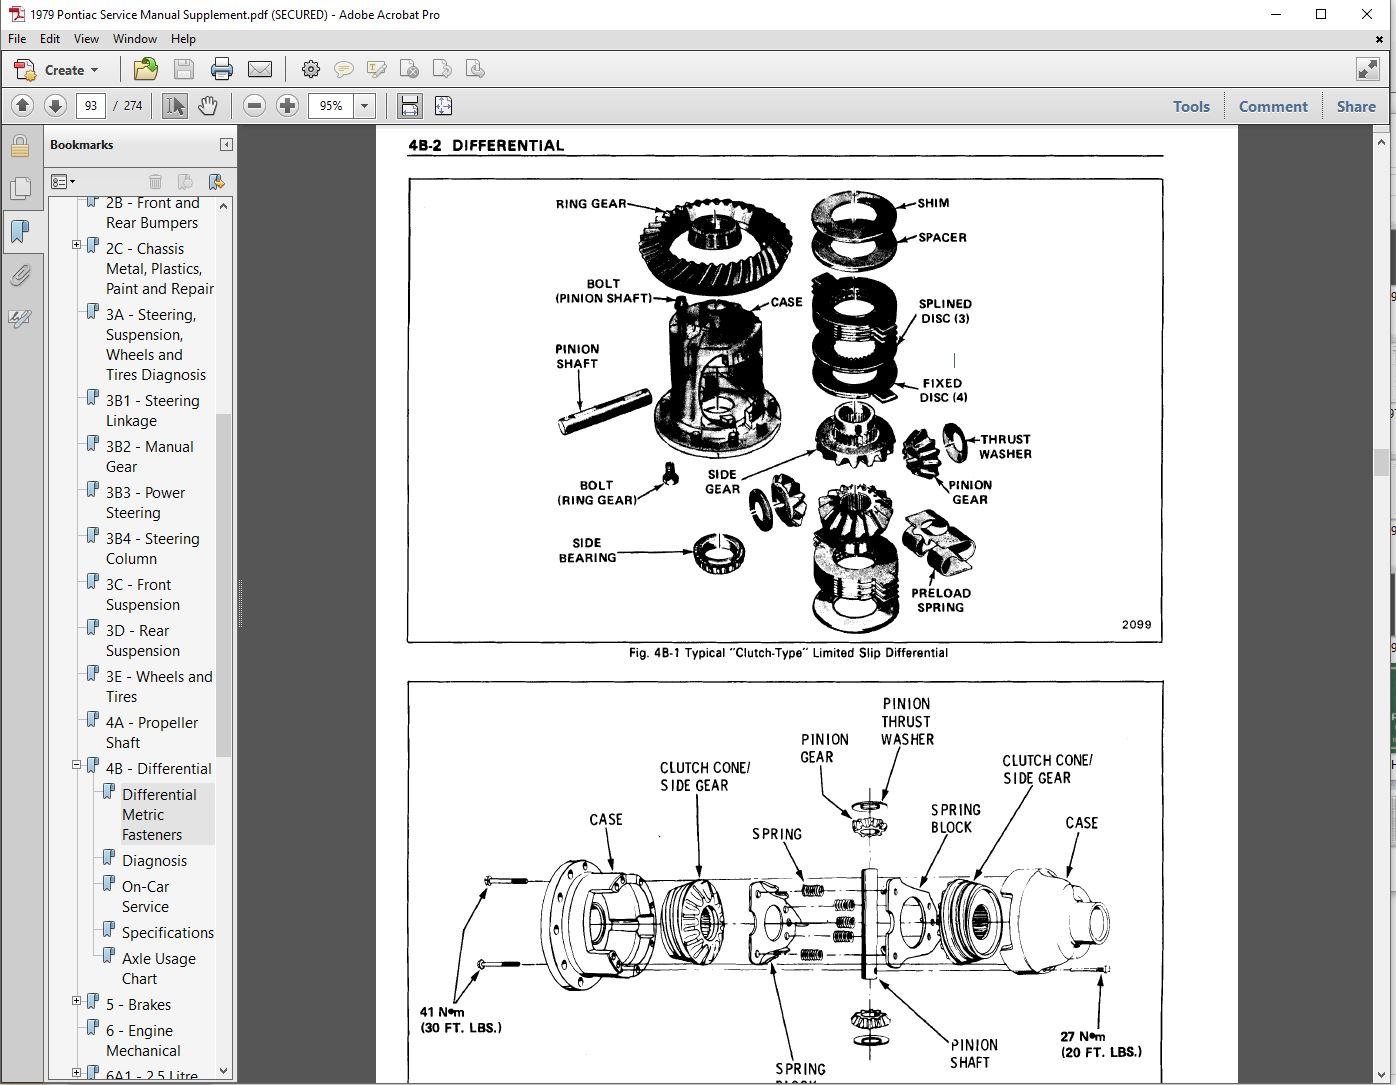 1979 pontiac complete restoration manual